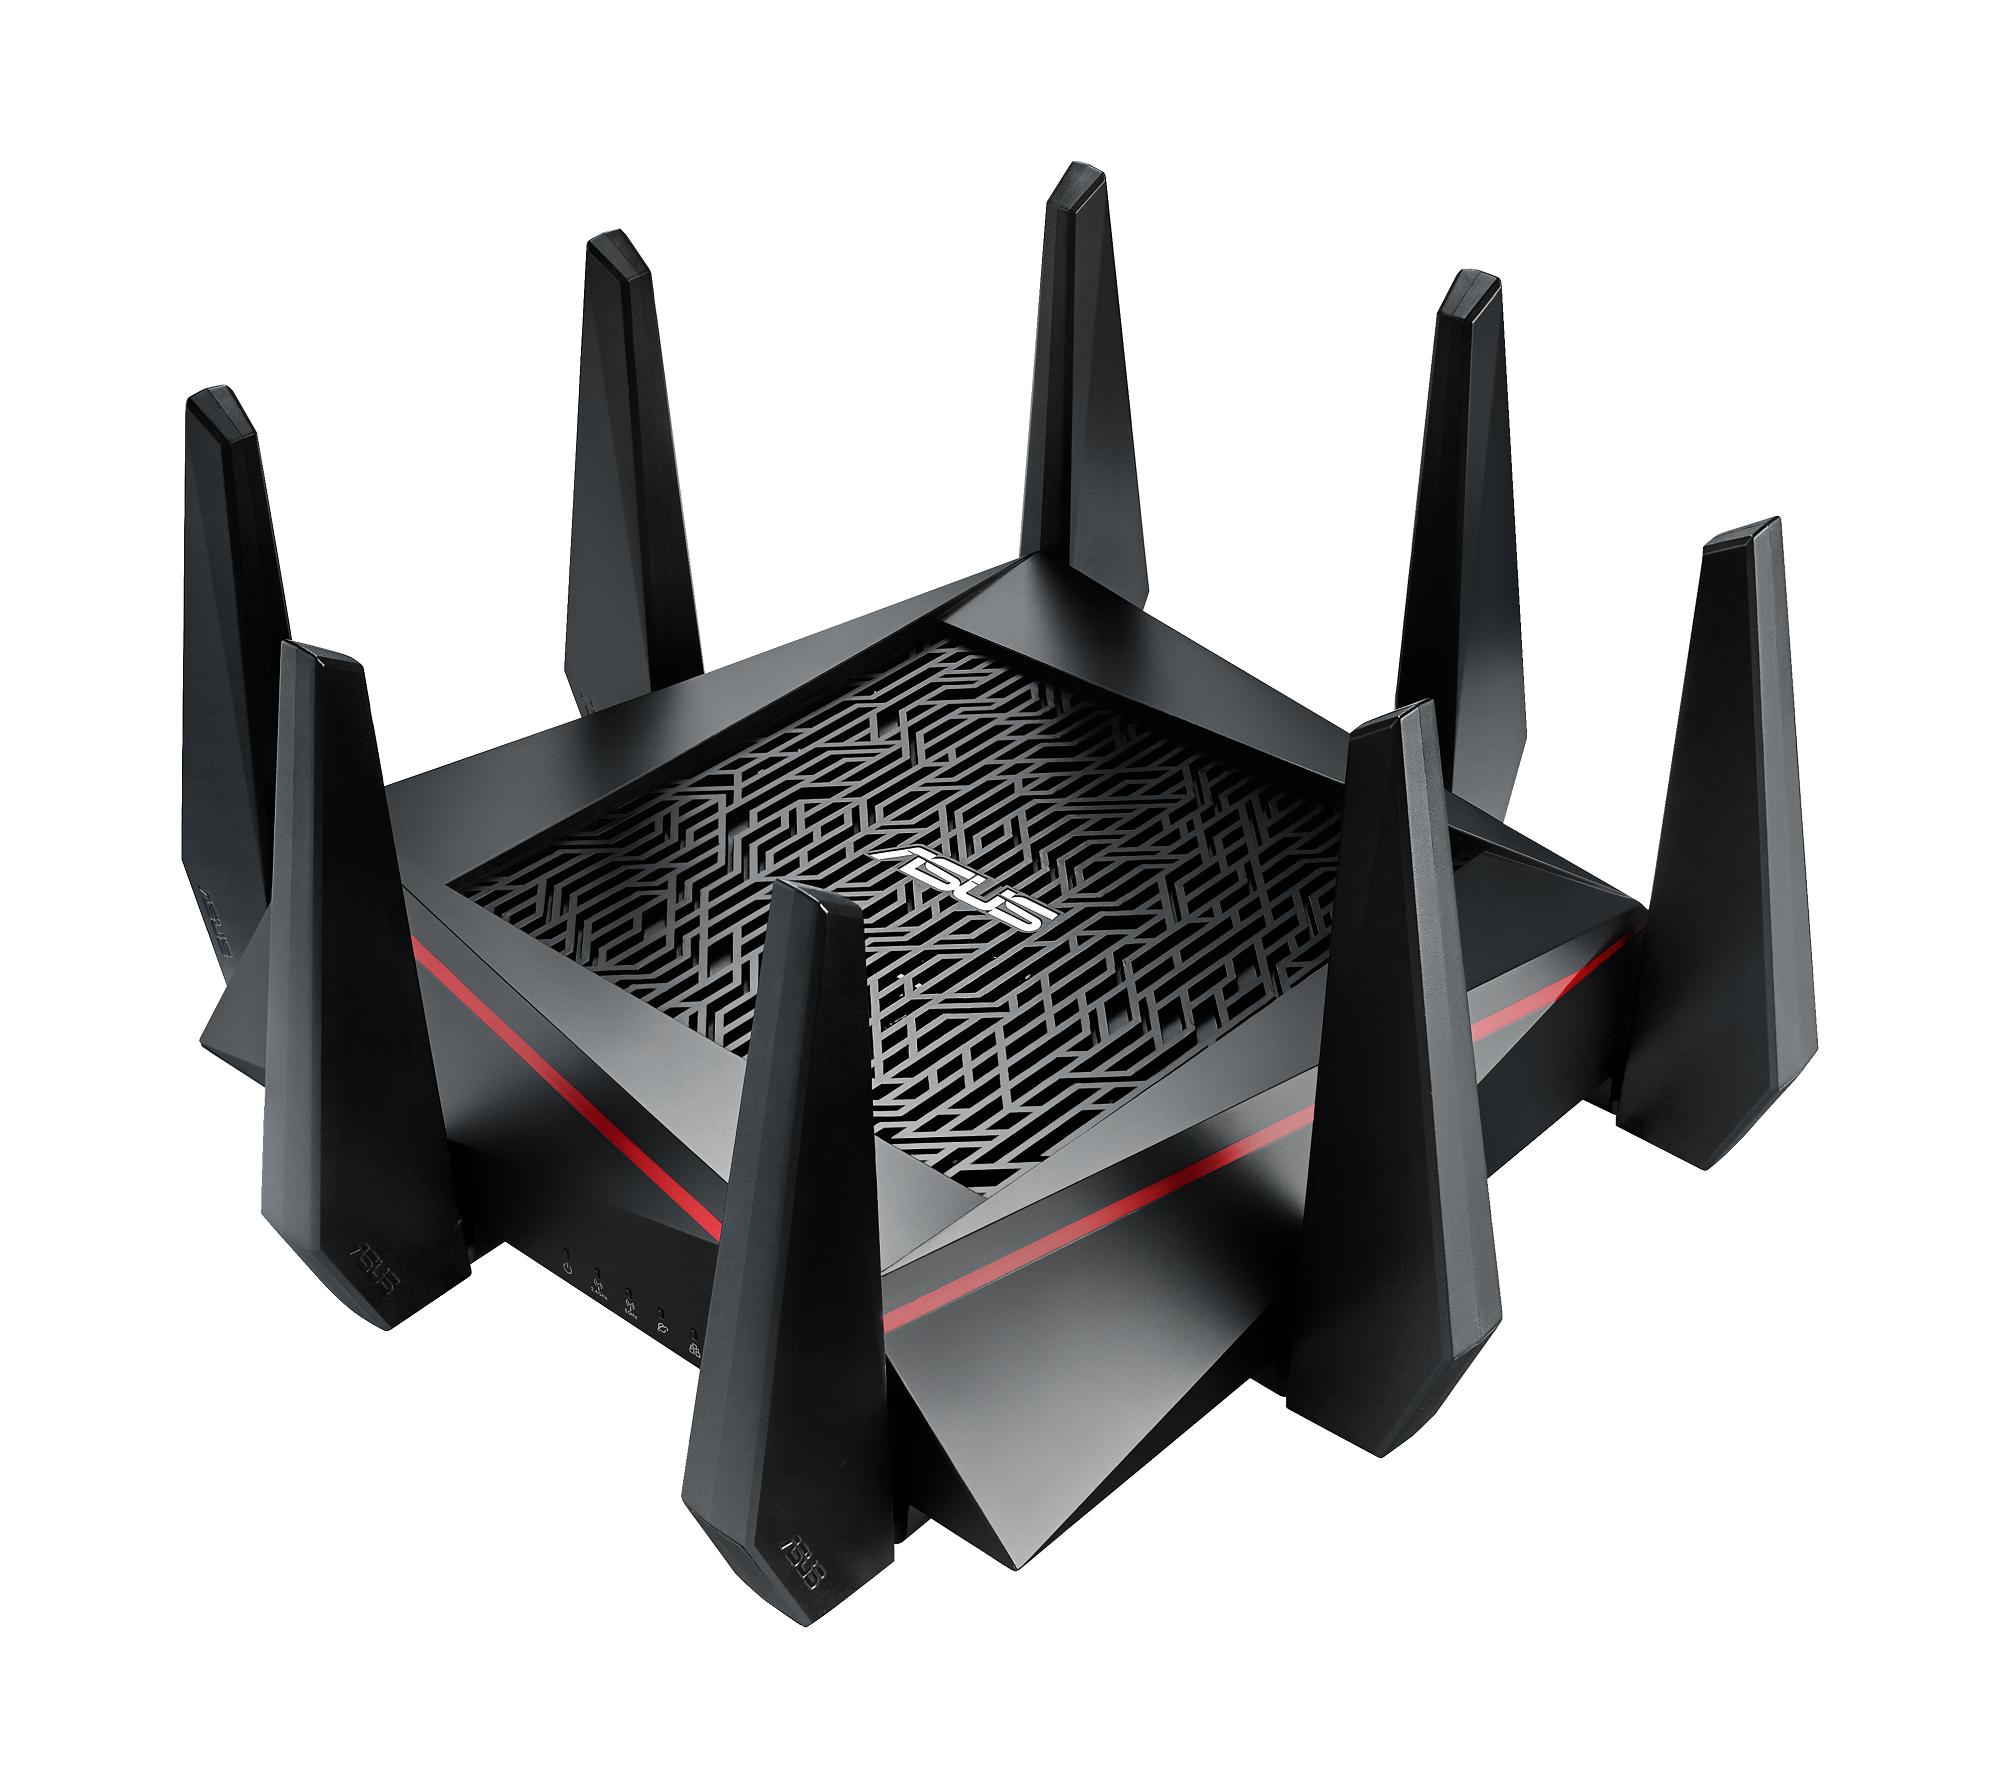 IFA 2015: ASUS Reveals RT-AC5300U Router: 8 Antenna Beast